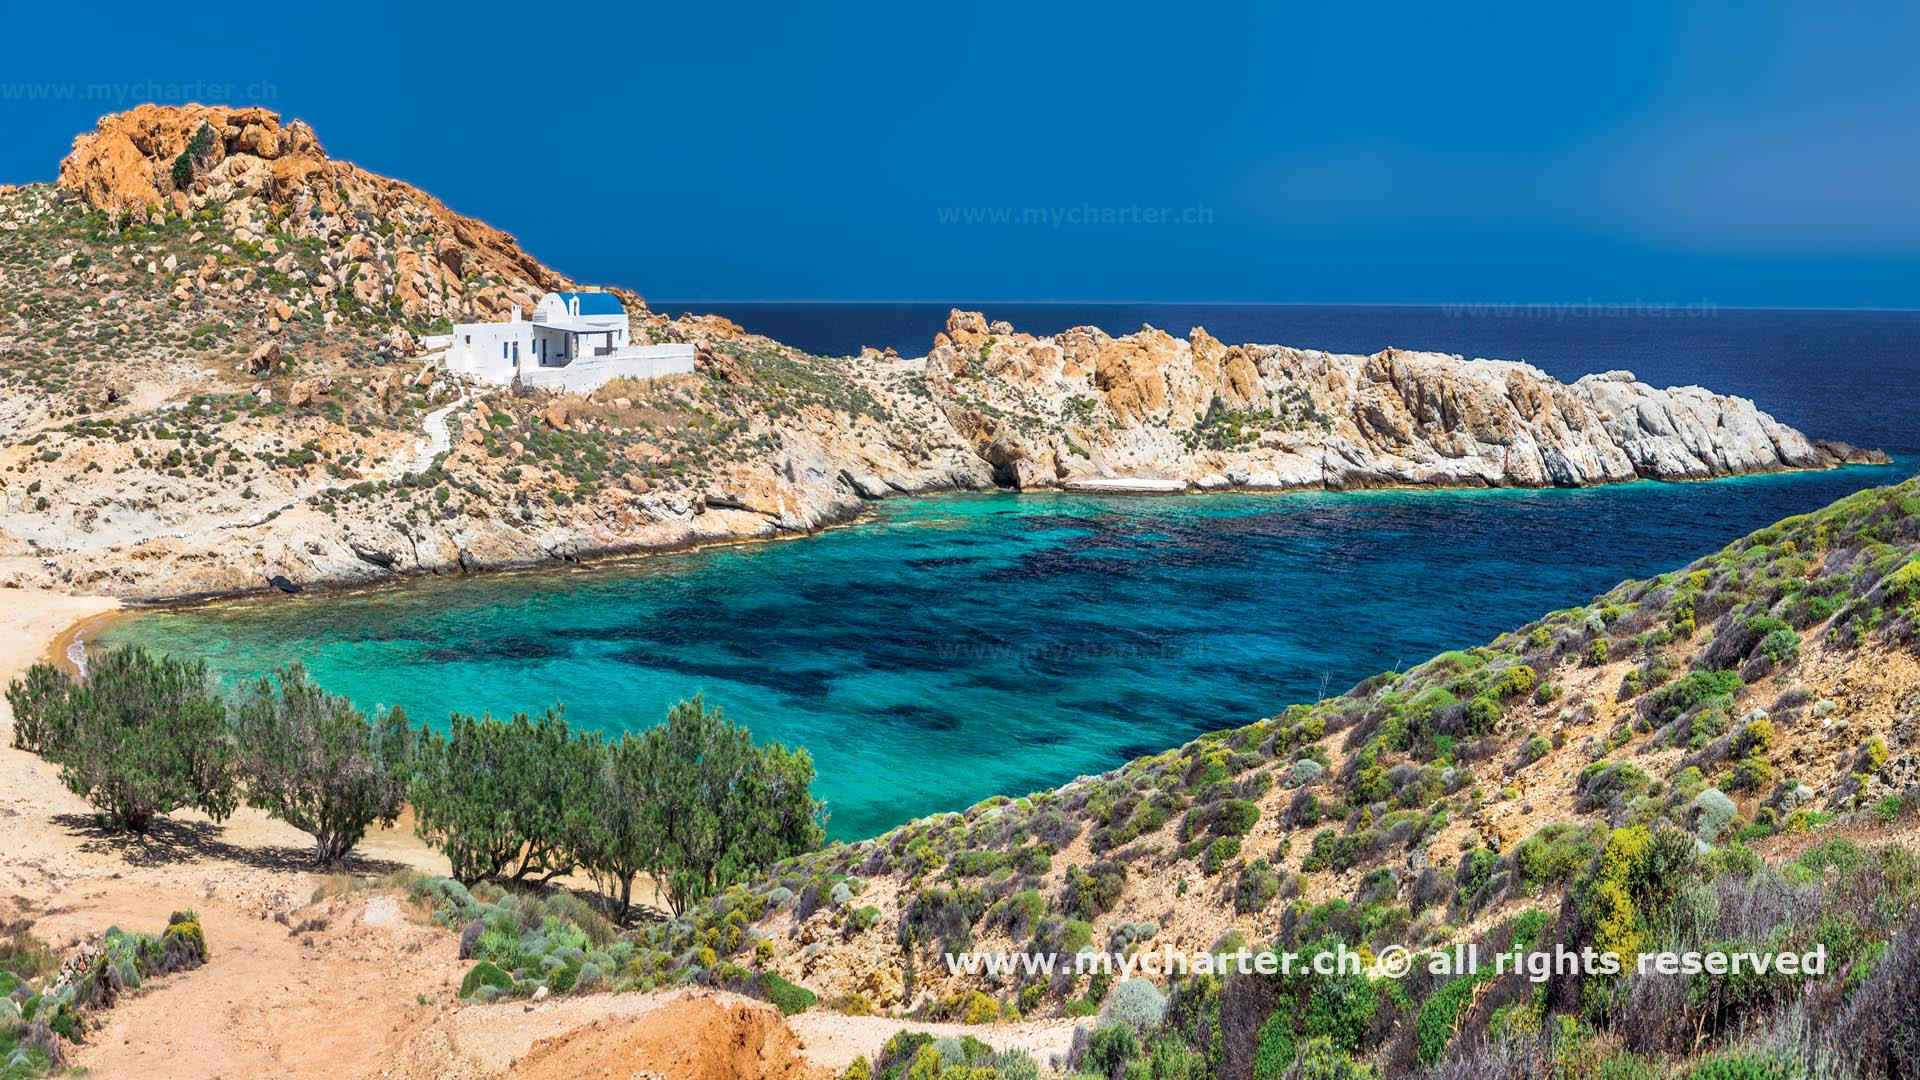 Griechenland - Sifnos